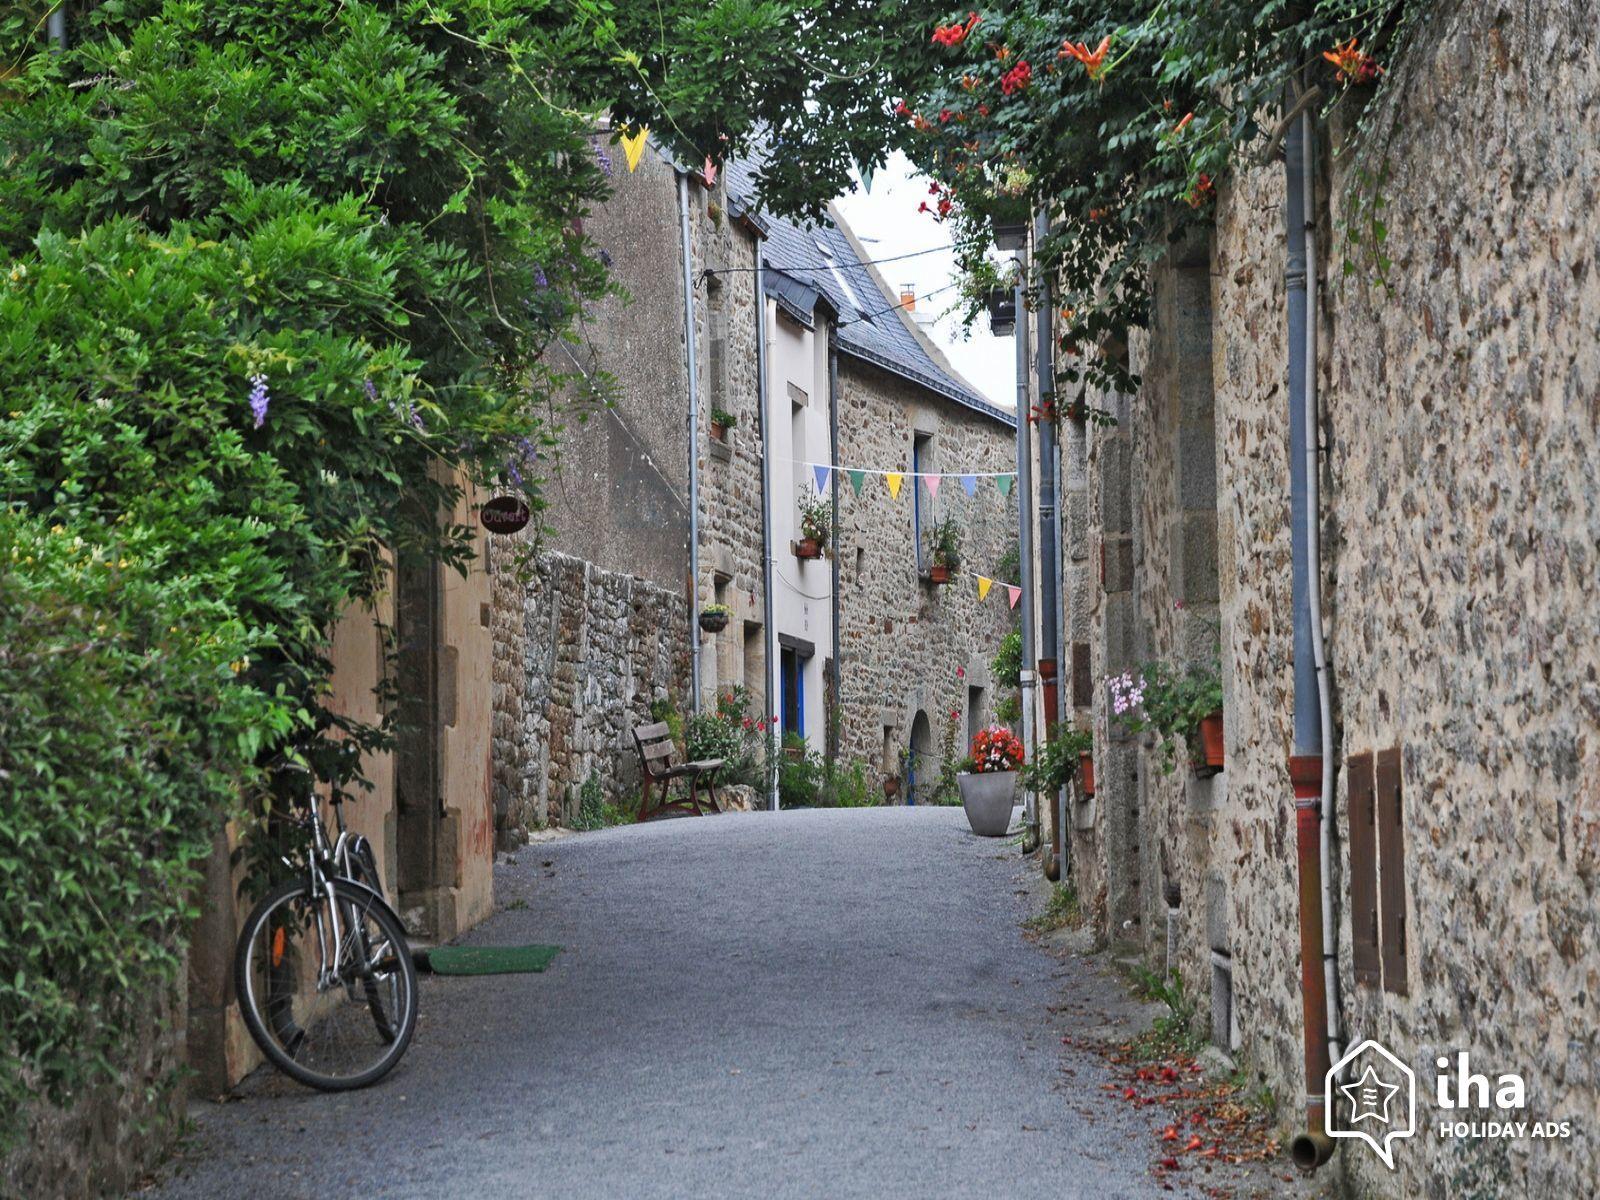 Location La Roche Bernard Pour Vos Vacances Avec Iha à Chambre D Hote La Roche Bernard